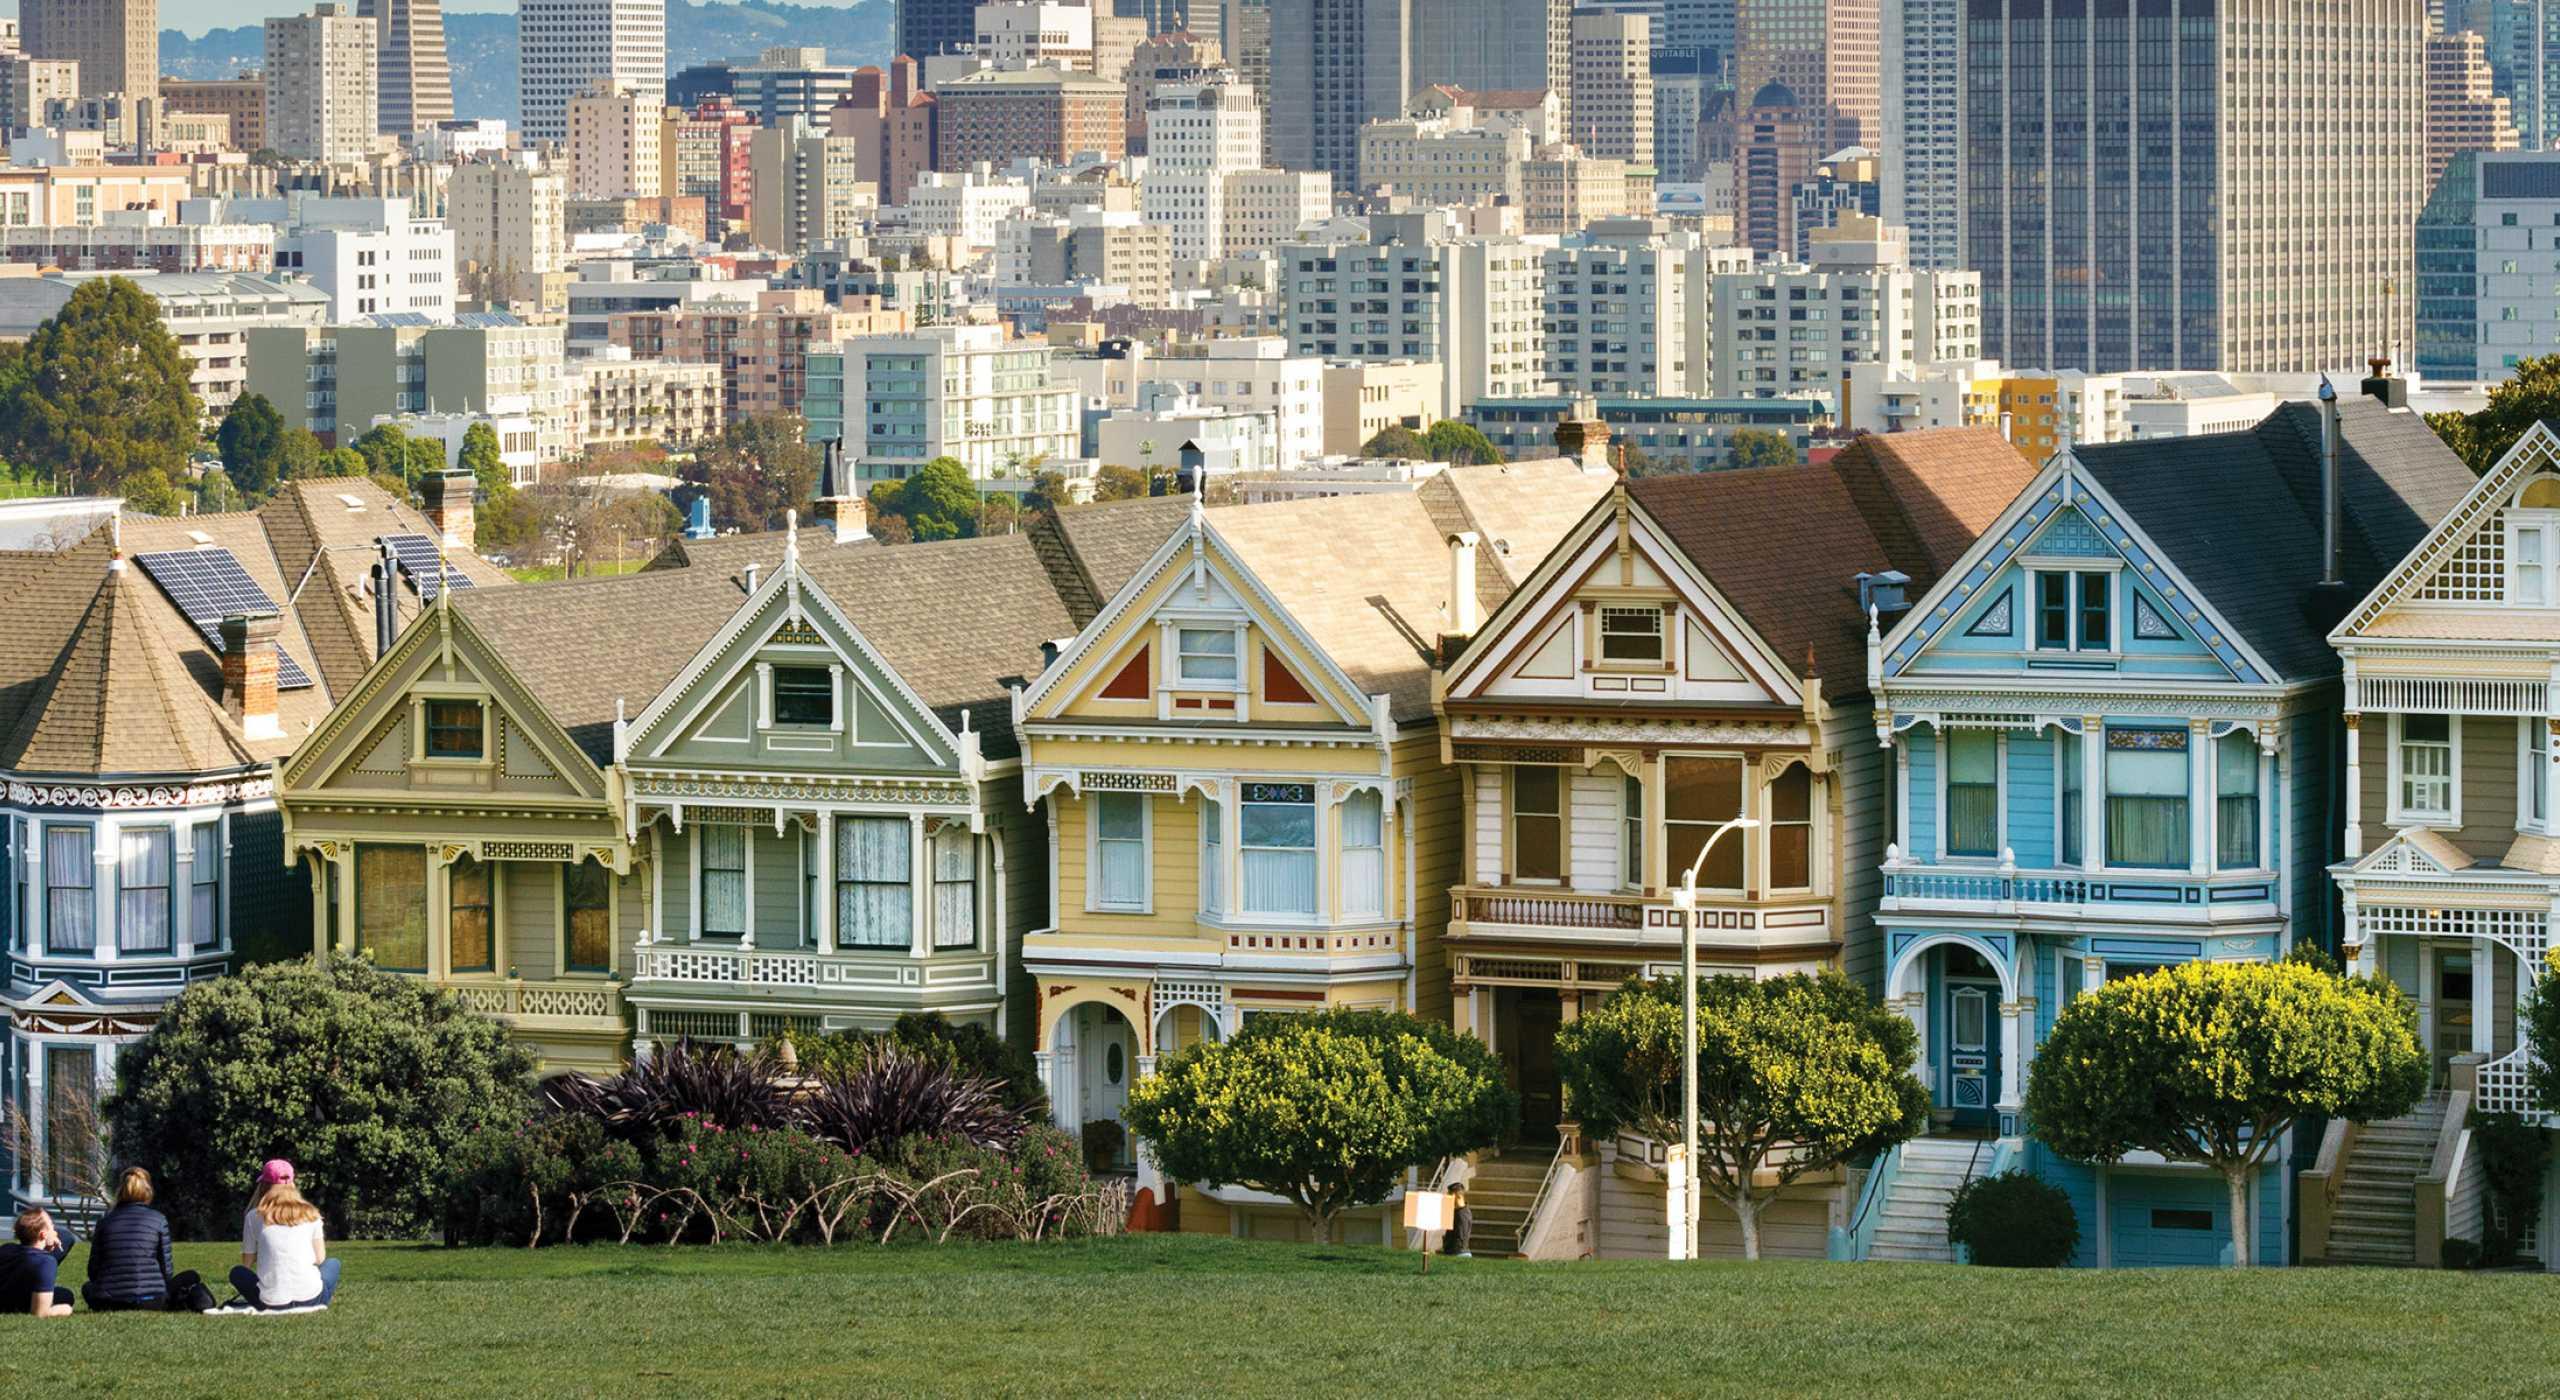 San Francisco, California: Icons and Surprises